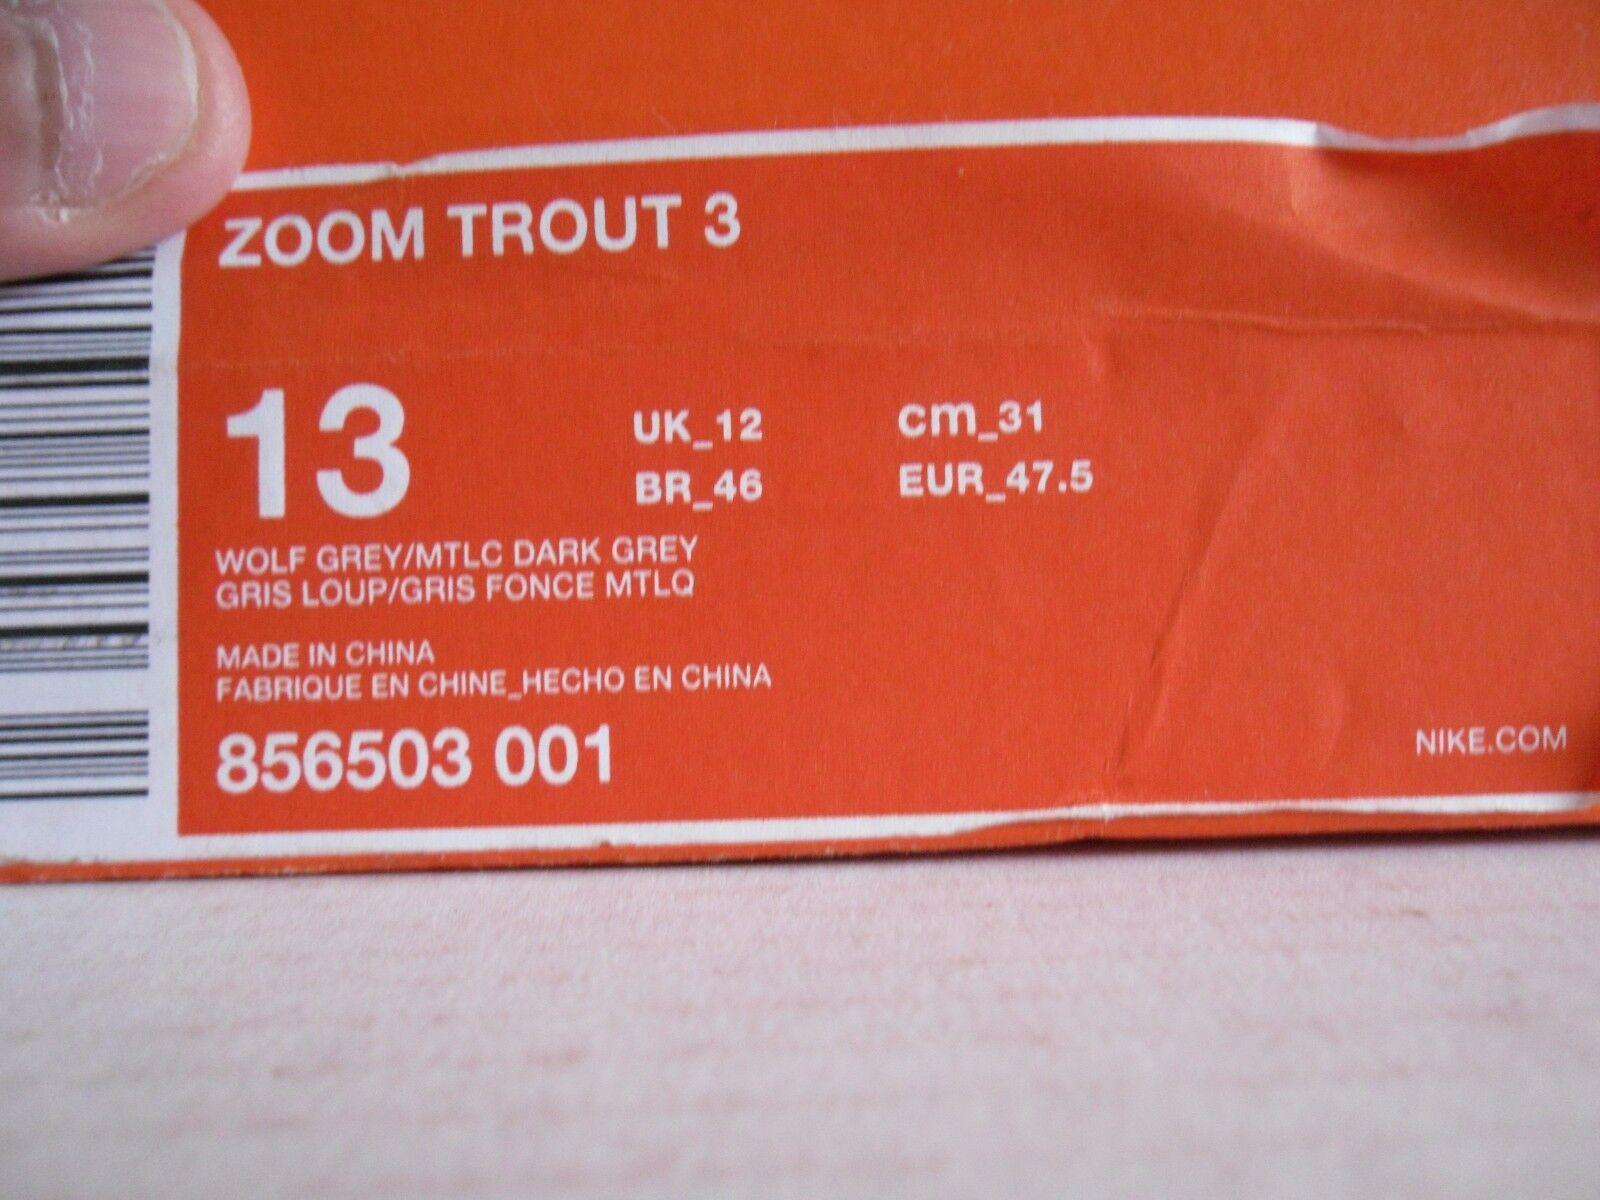 NIKE ZOOM TROUT SZ 3 WOLF gris -METALLIC DARK gris SZ TROUT 13 CLEATS c9130f